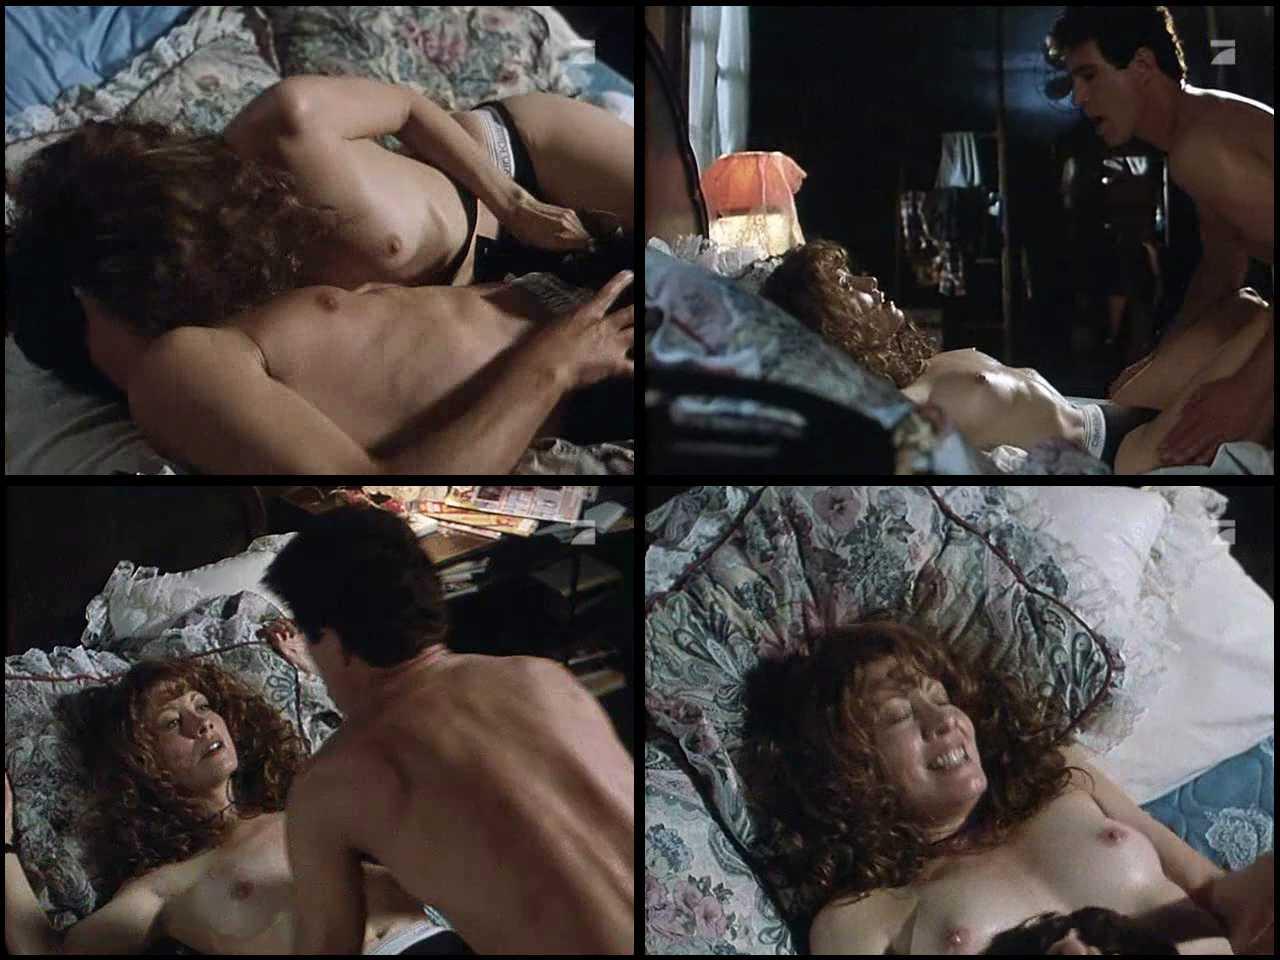 Picard linda kozlowski posing nude